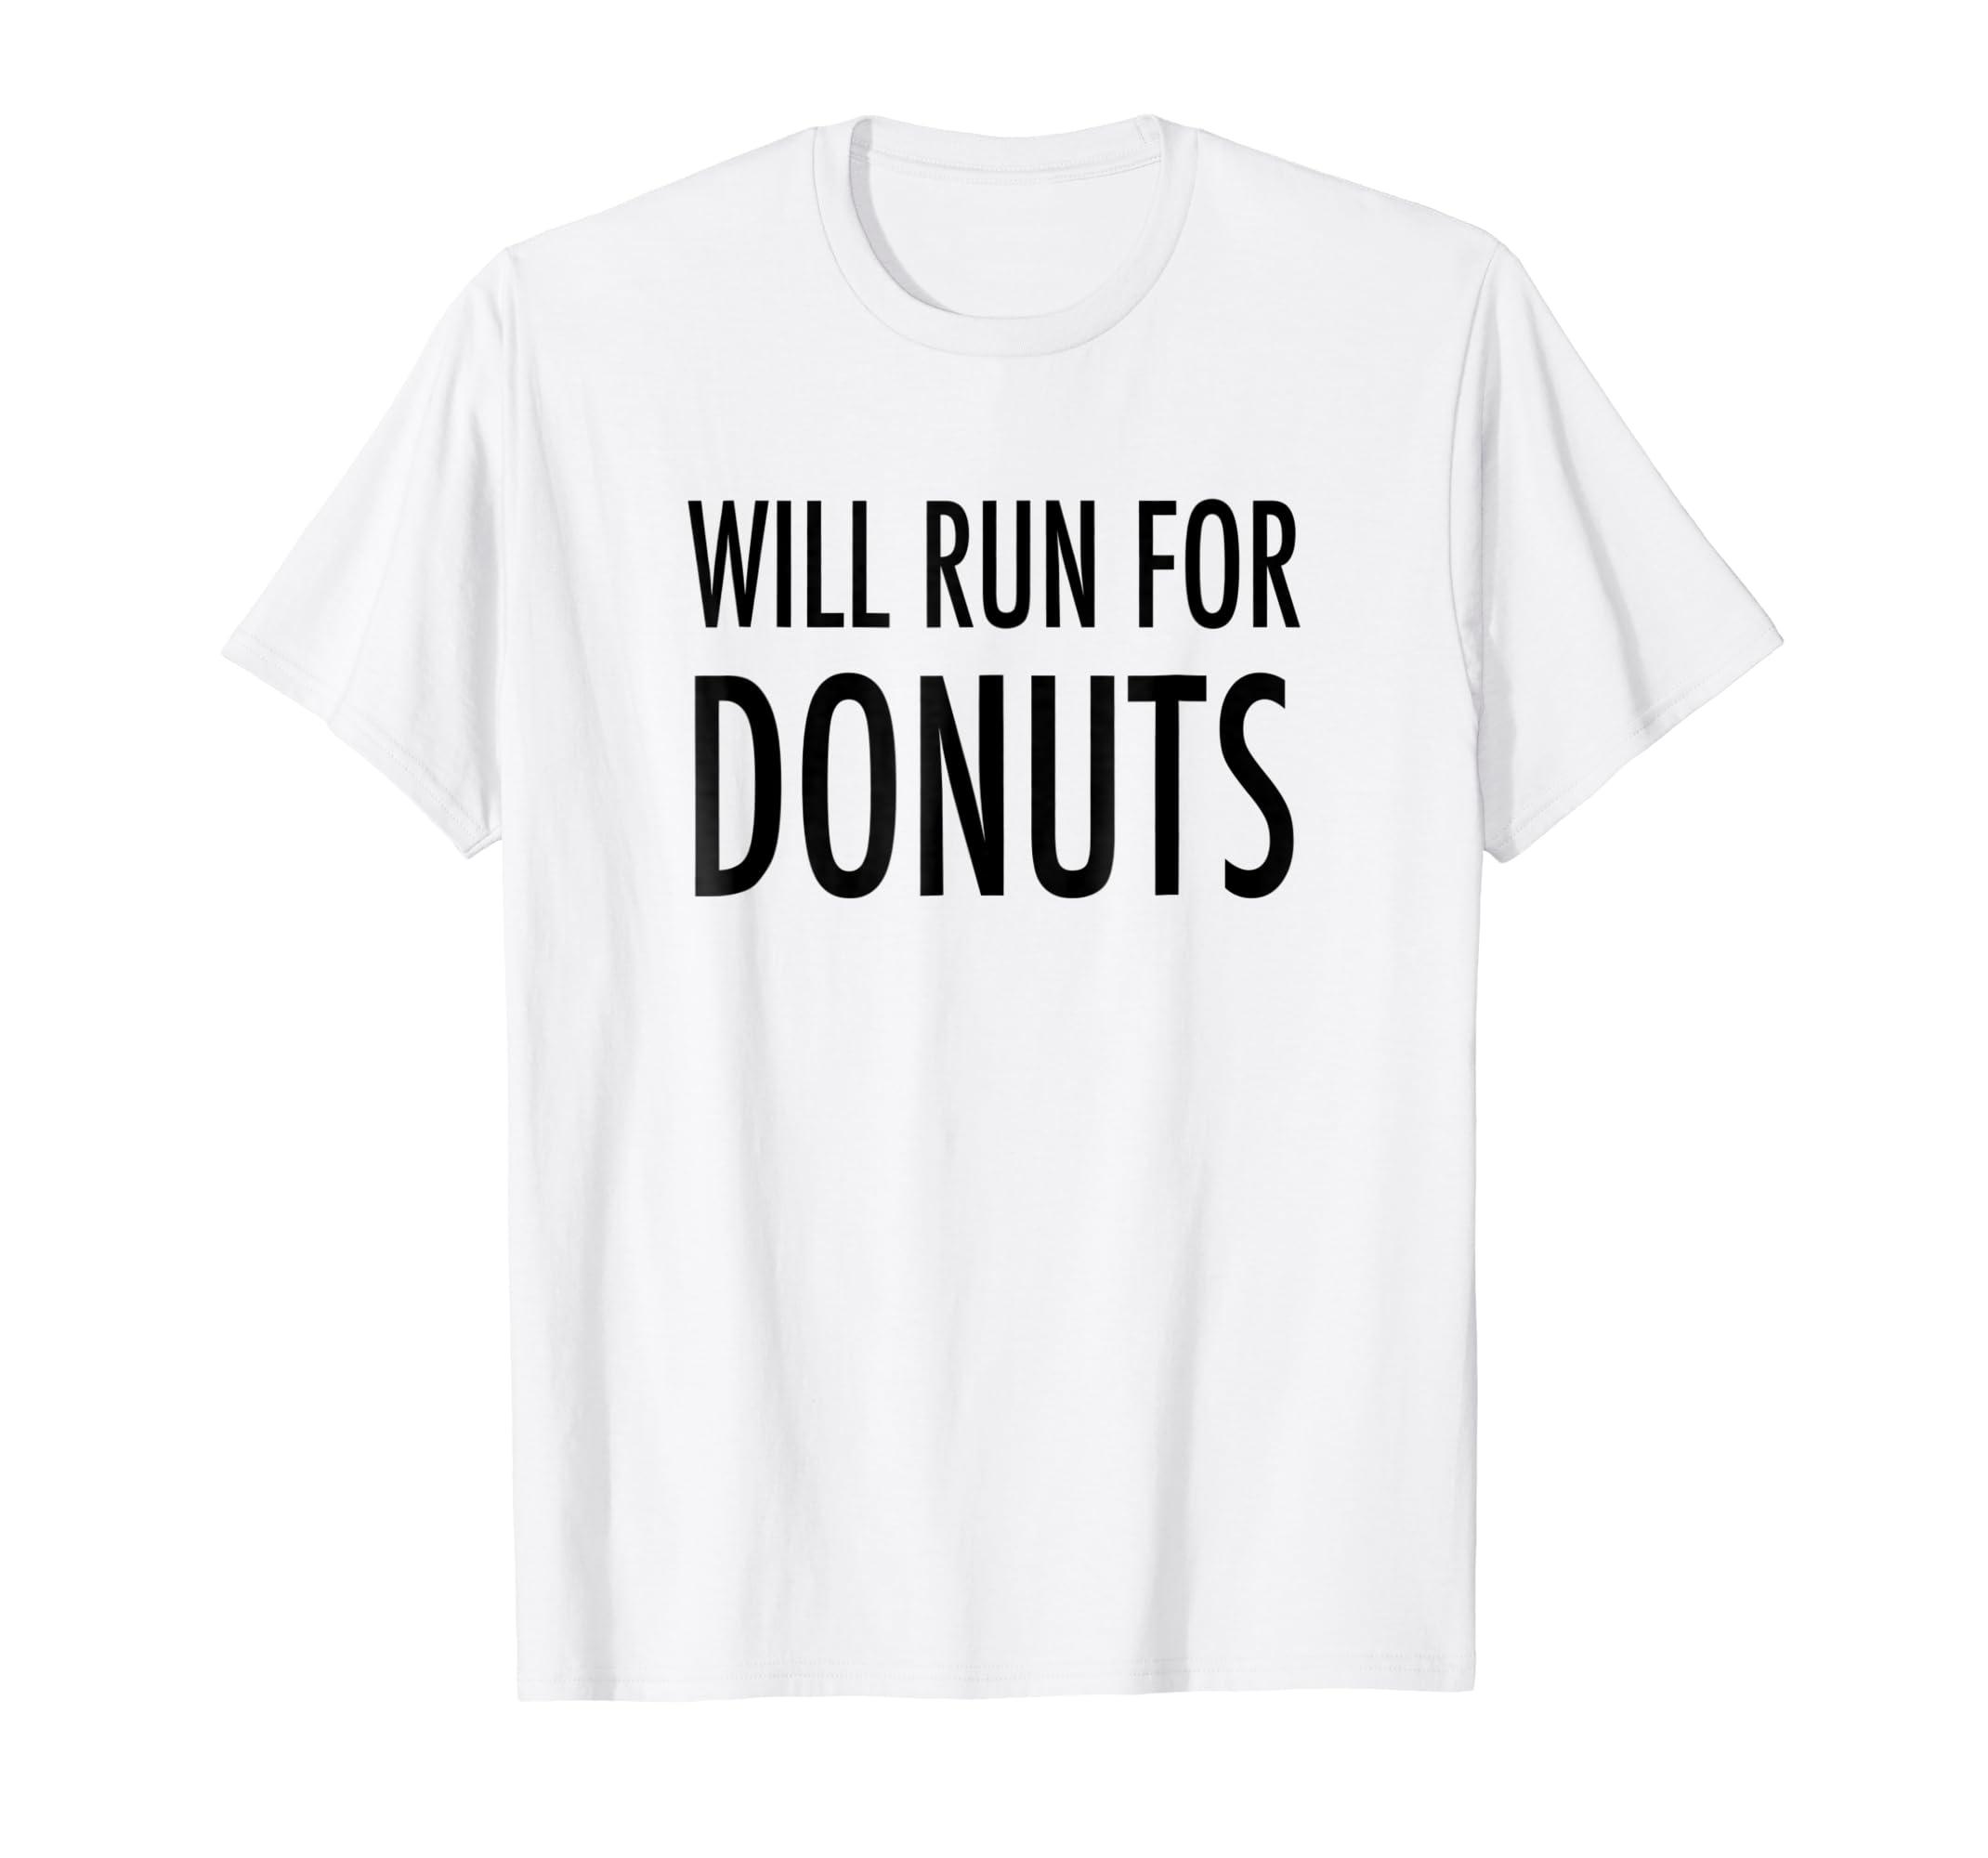 ea986238 Funny Slogan Running Shirts - DREAMWORKS